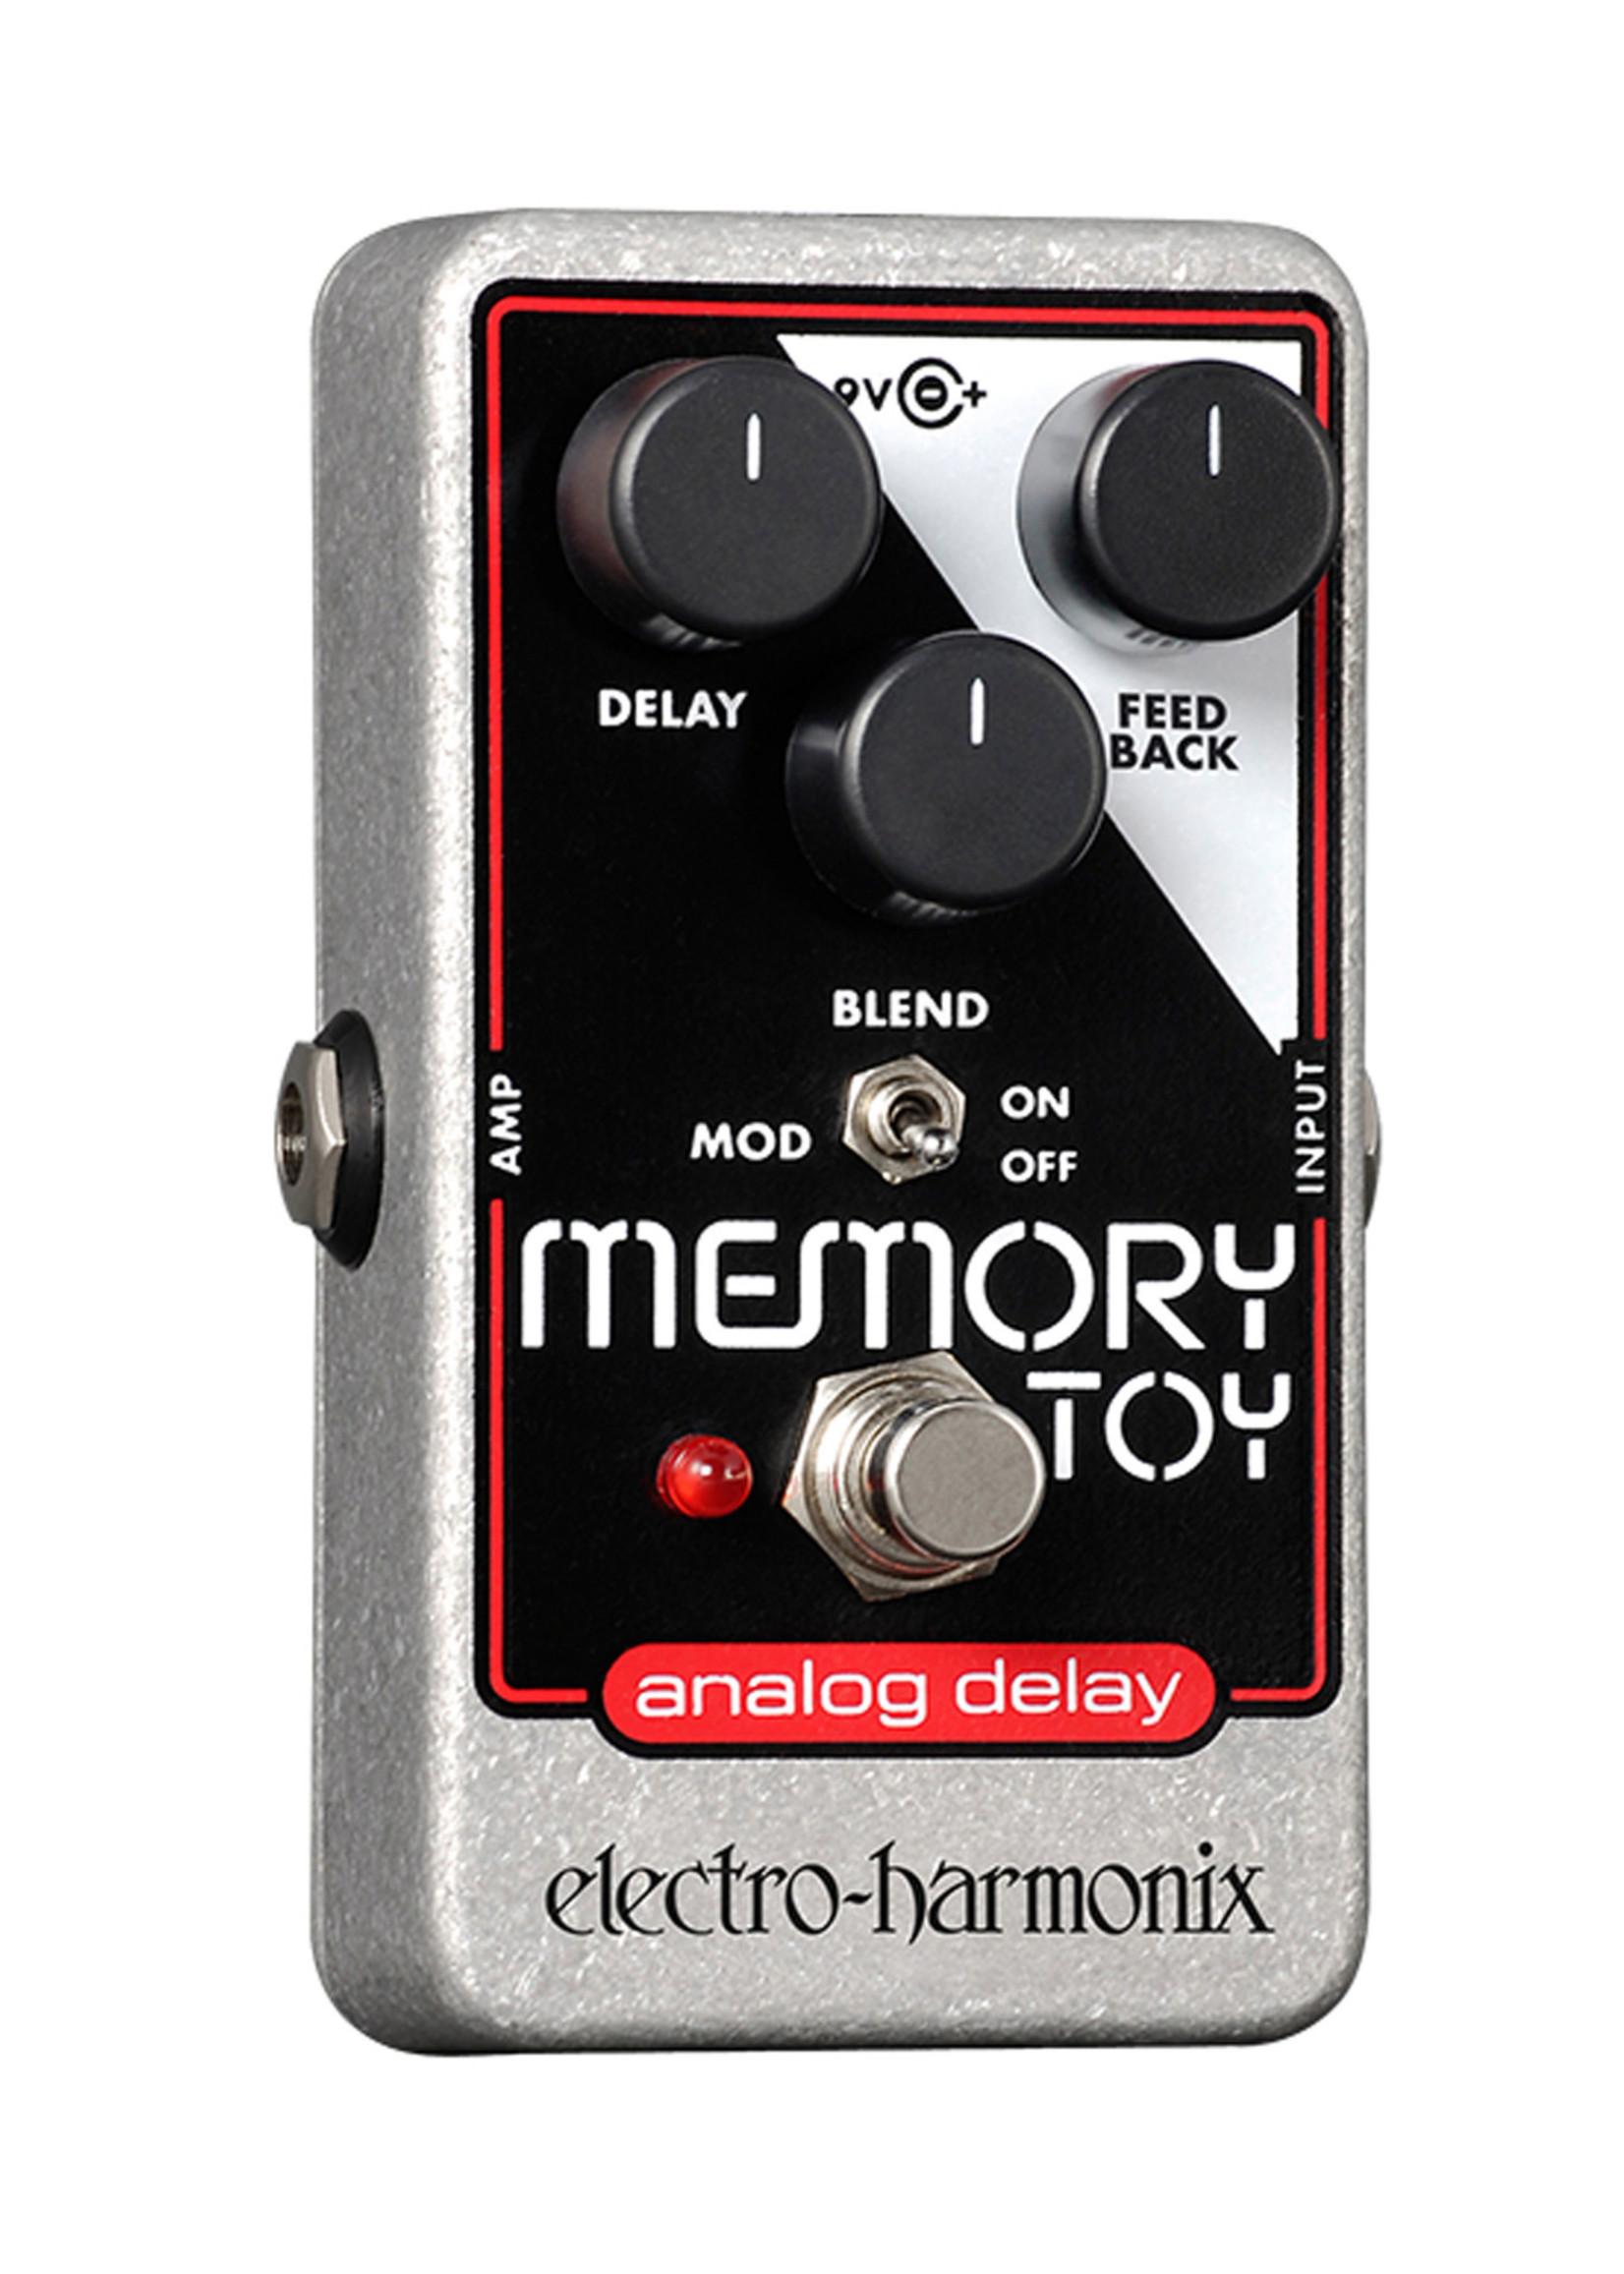 Electro Harmonix EHX Memory Toy Analog Delay